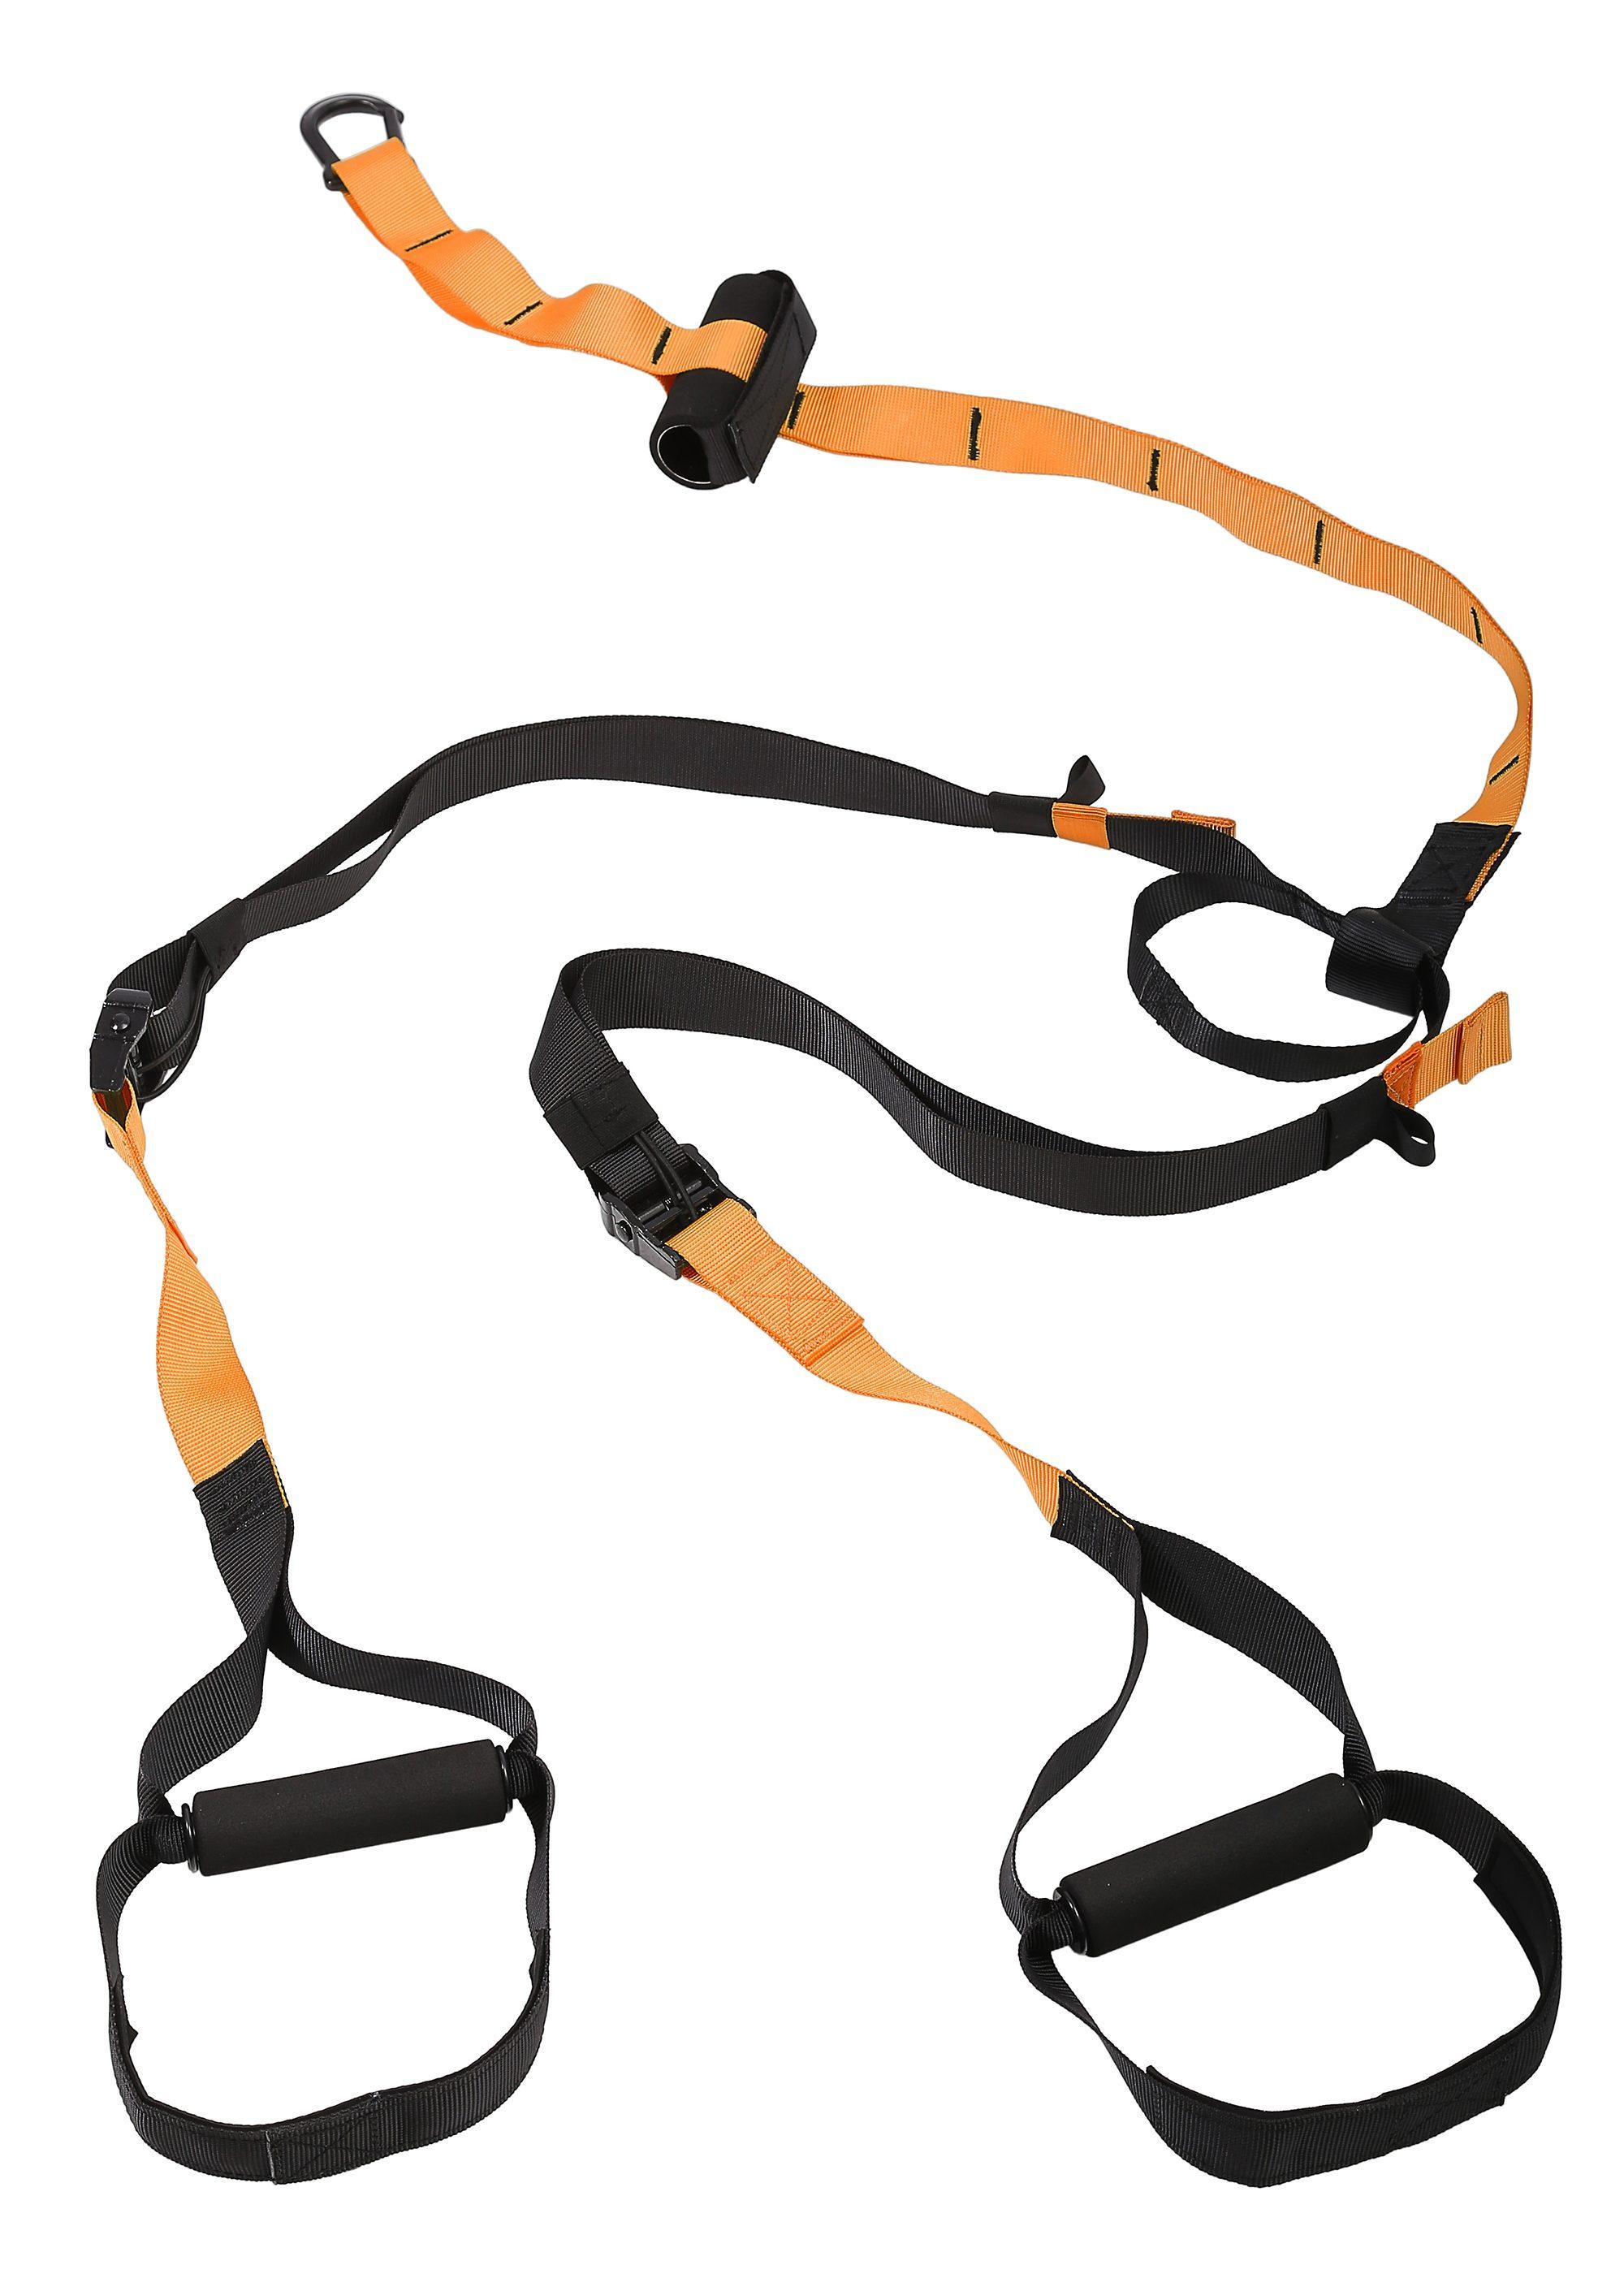 Schlingentrainer, »Sling Trainer SP-TX-001«, Sportplus